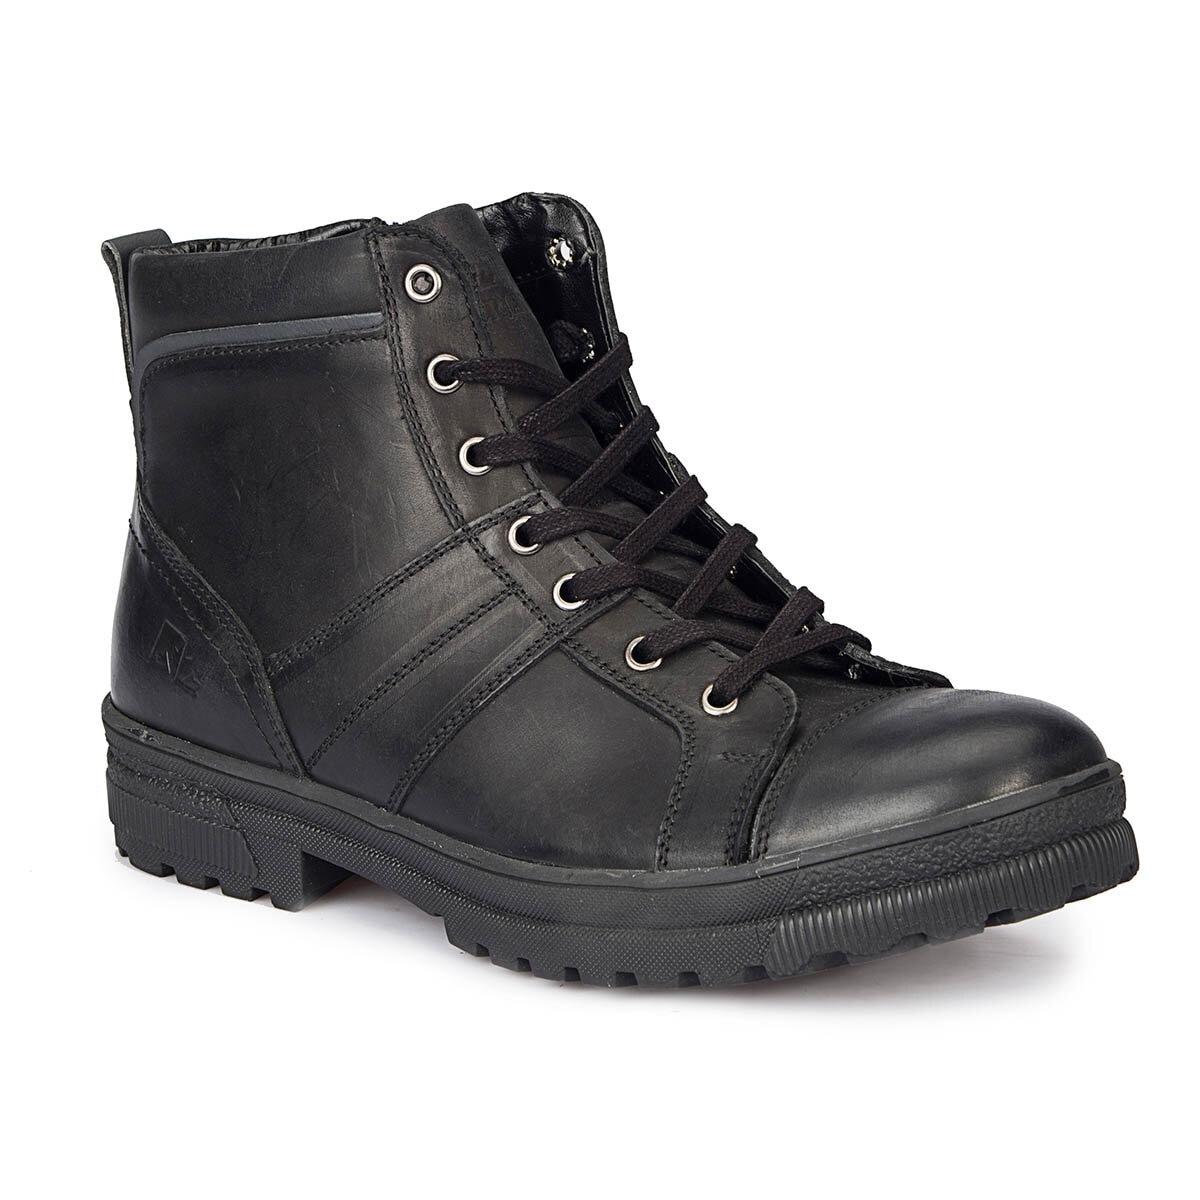 FLO KAPPA HI Black Men Boots LUMBERJACK